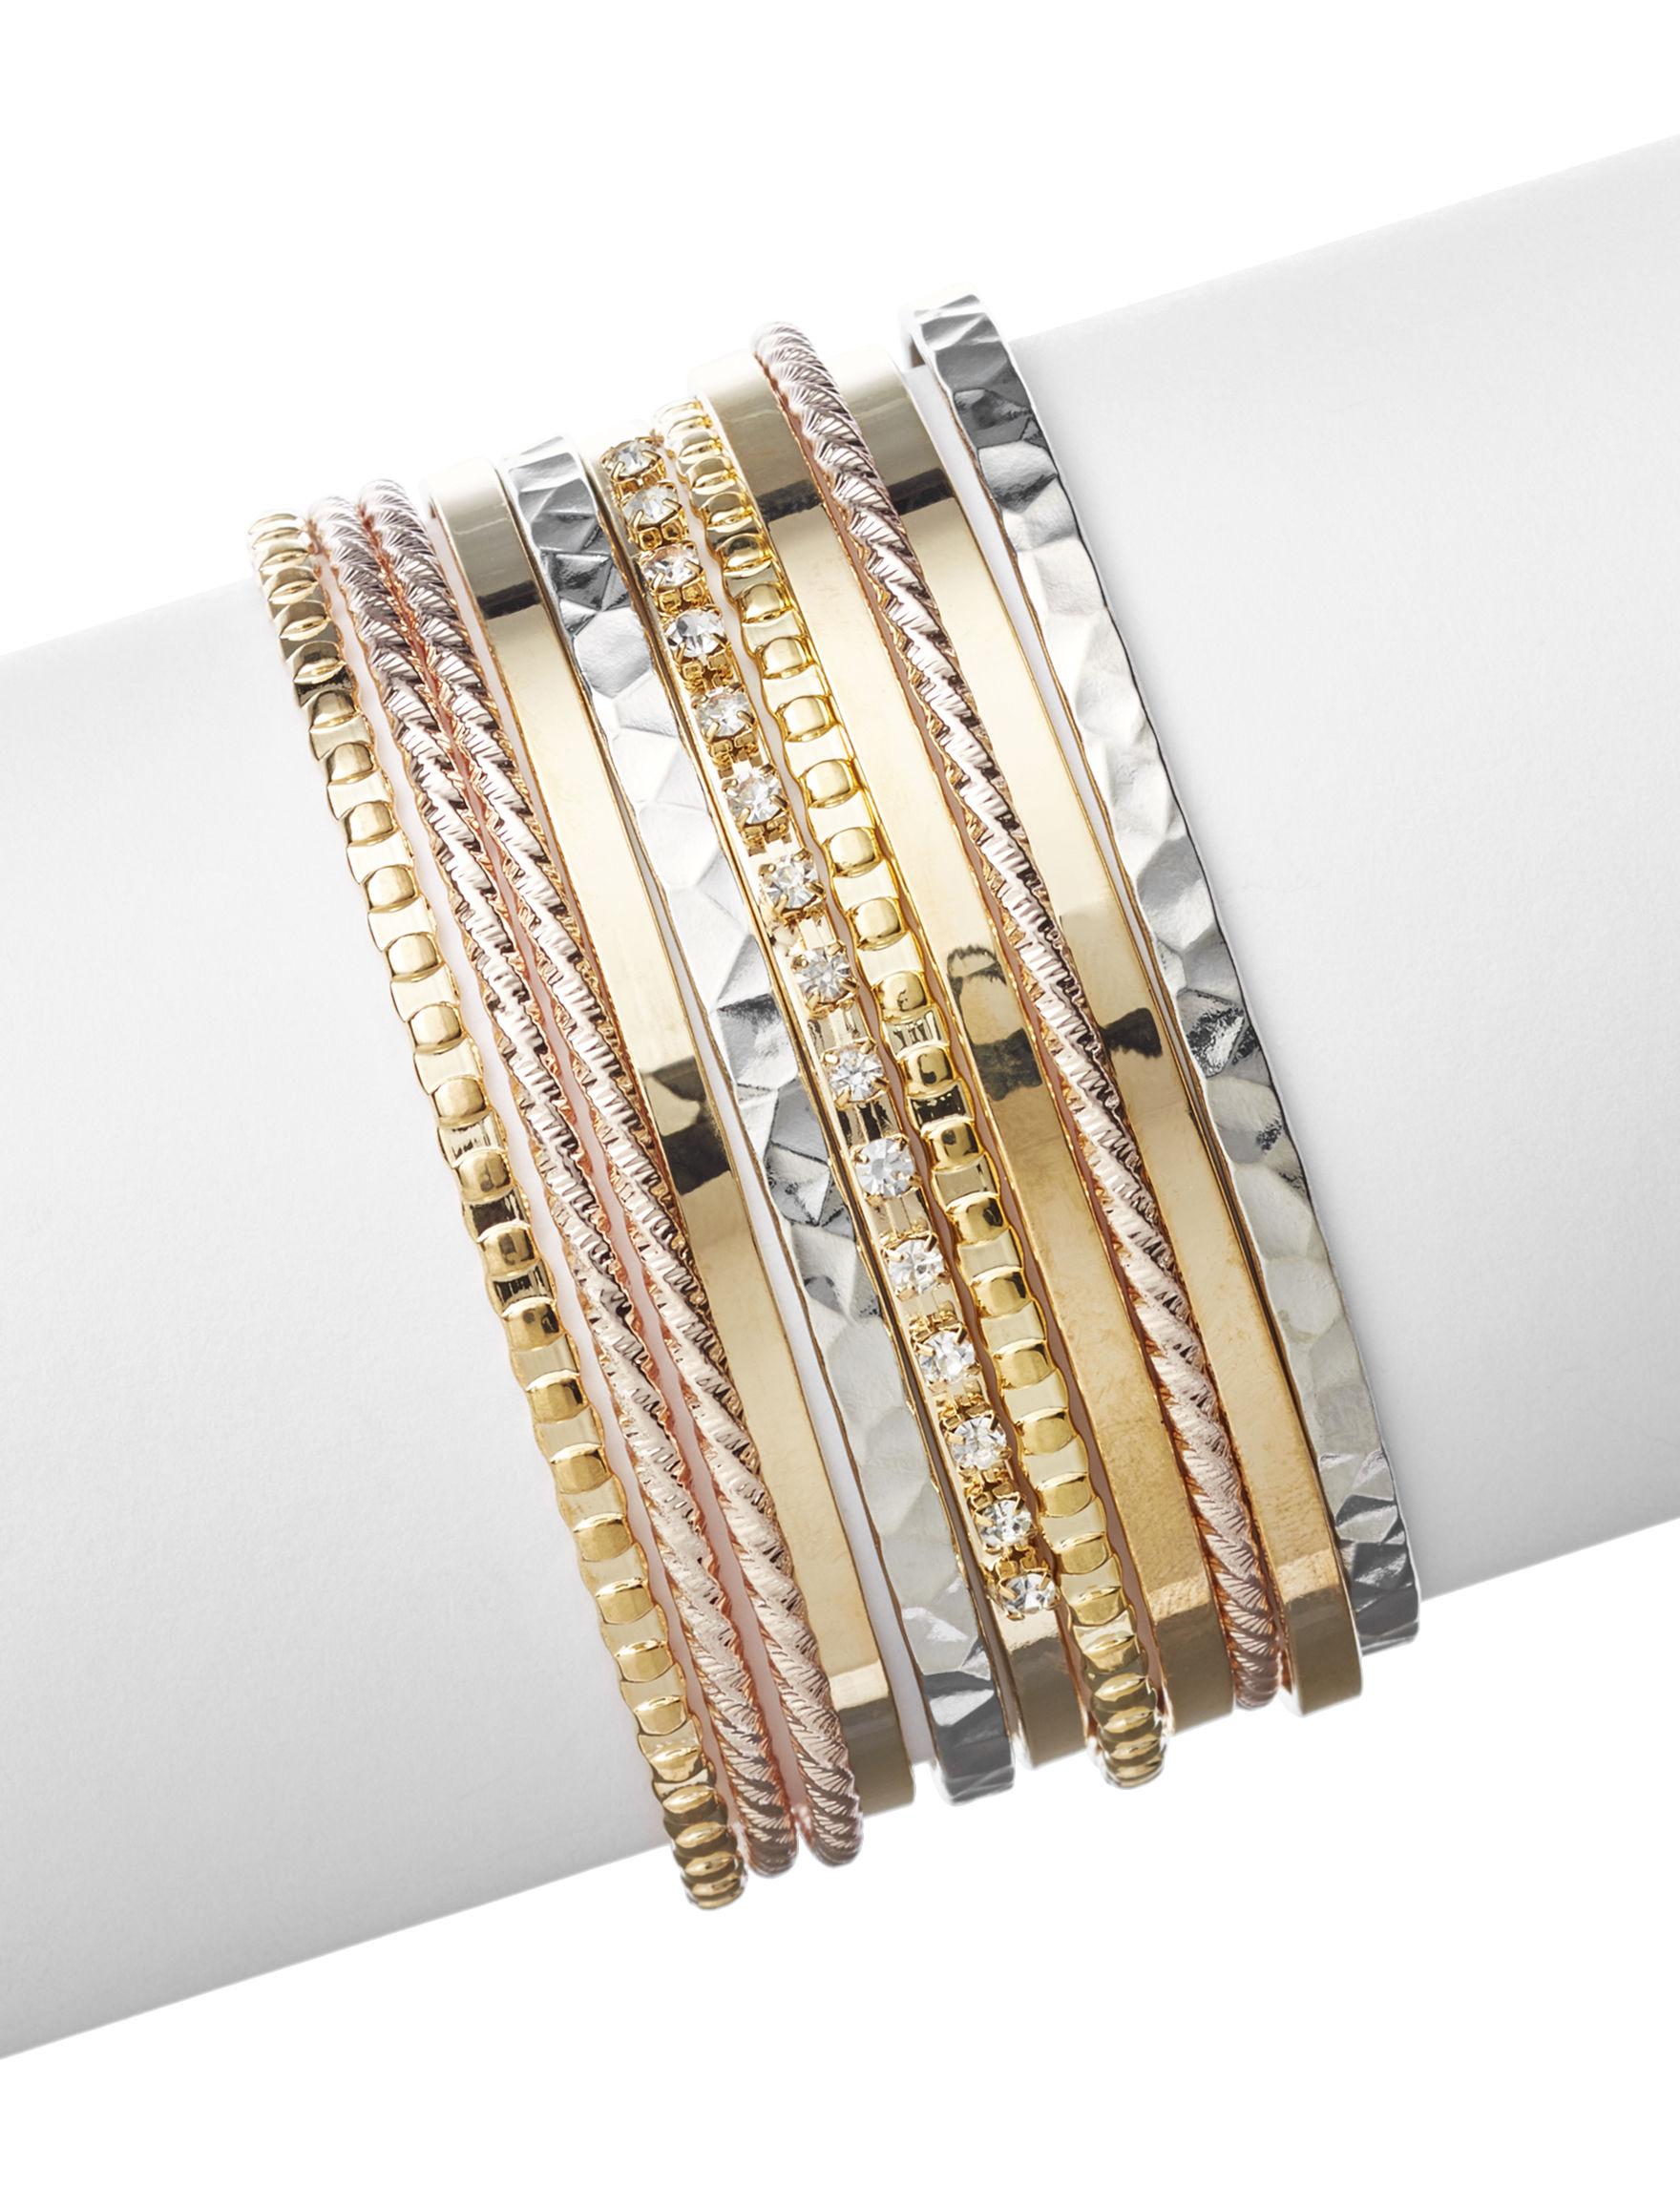 Signature Studio Gold Fashion Jewelry